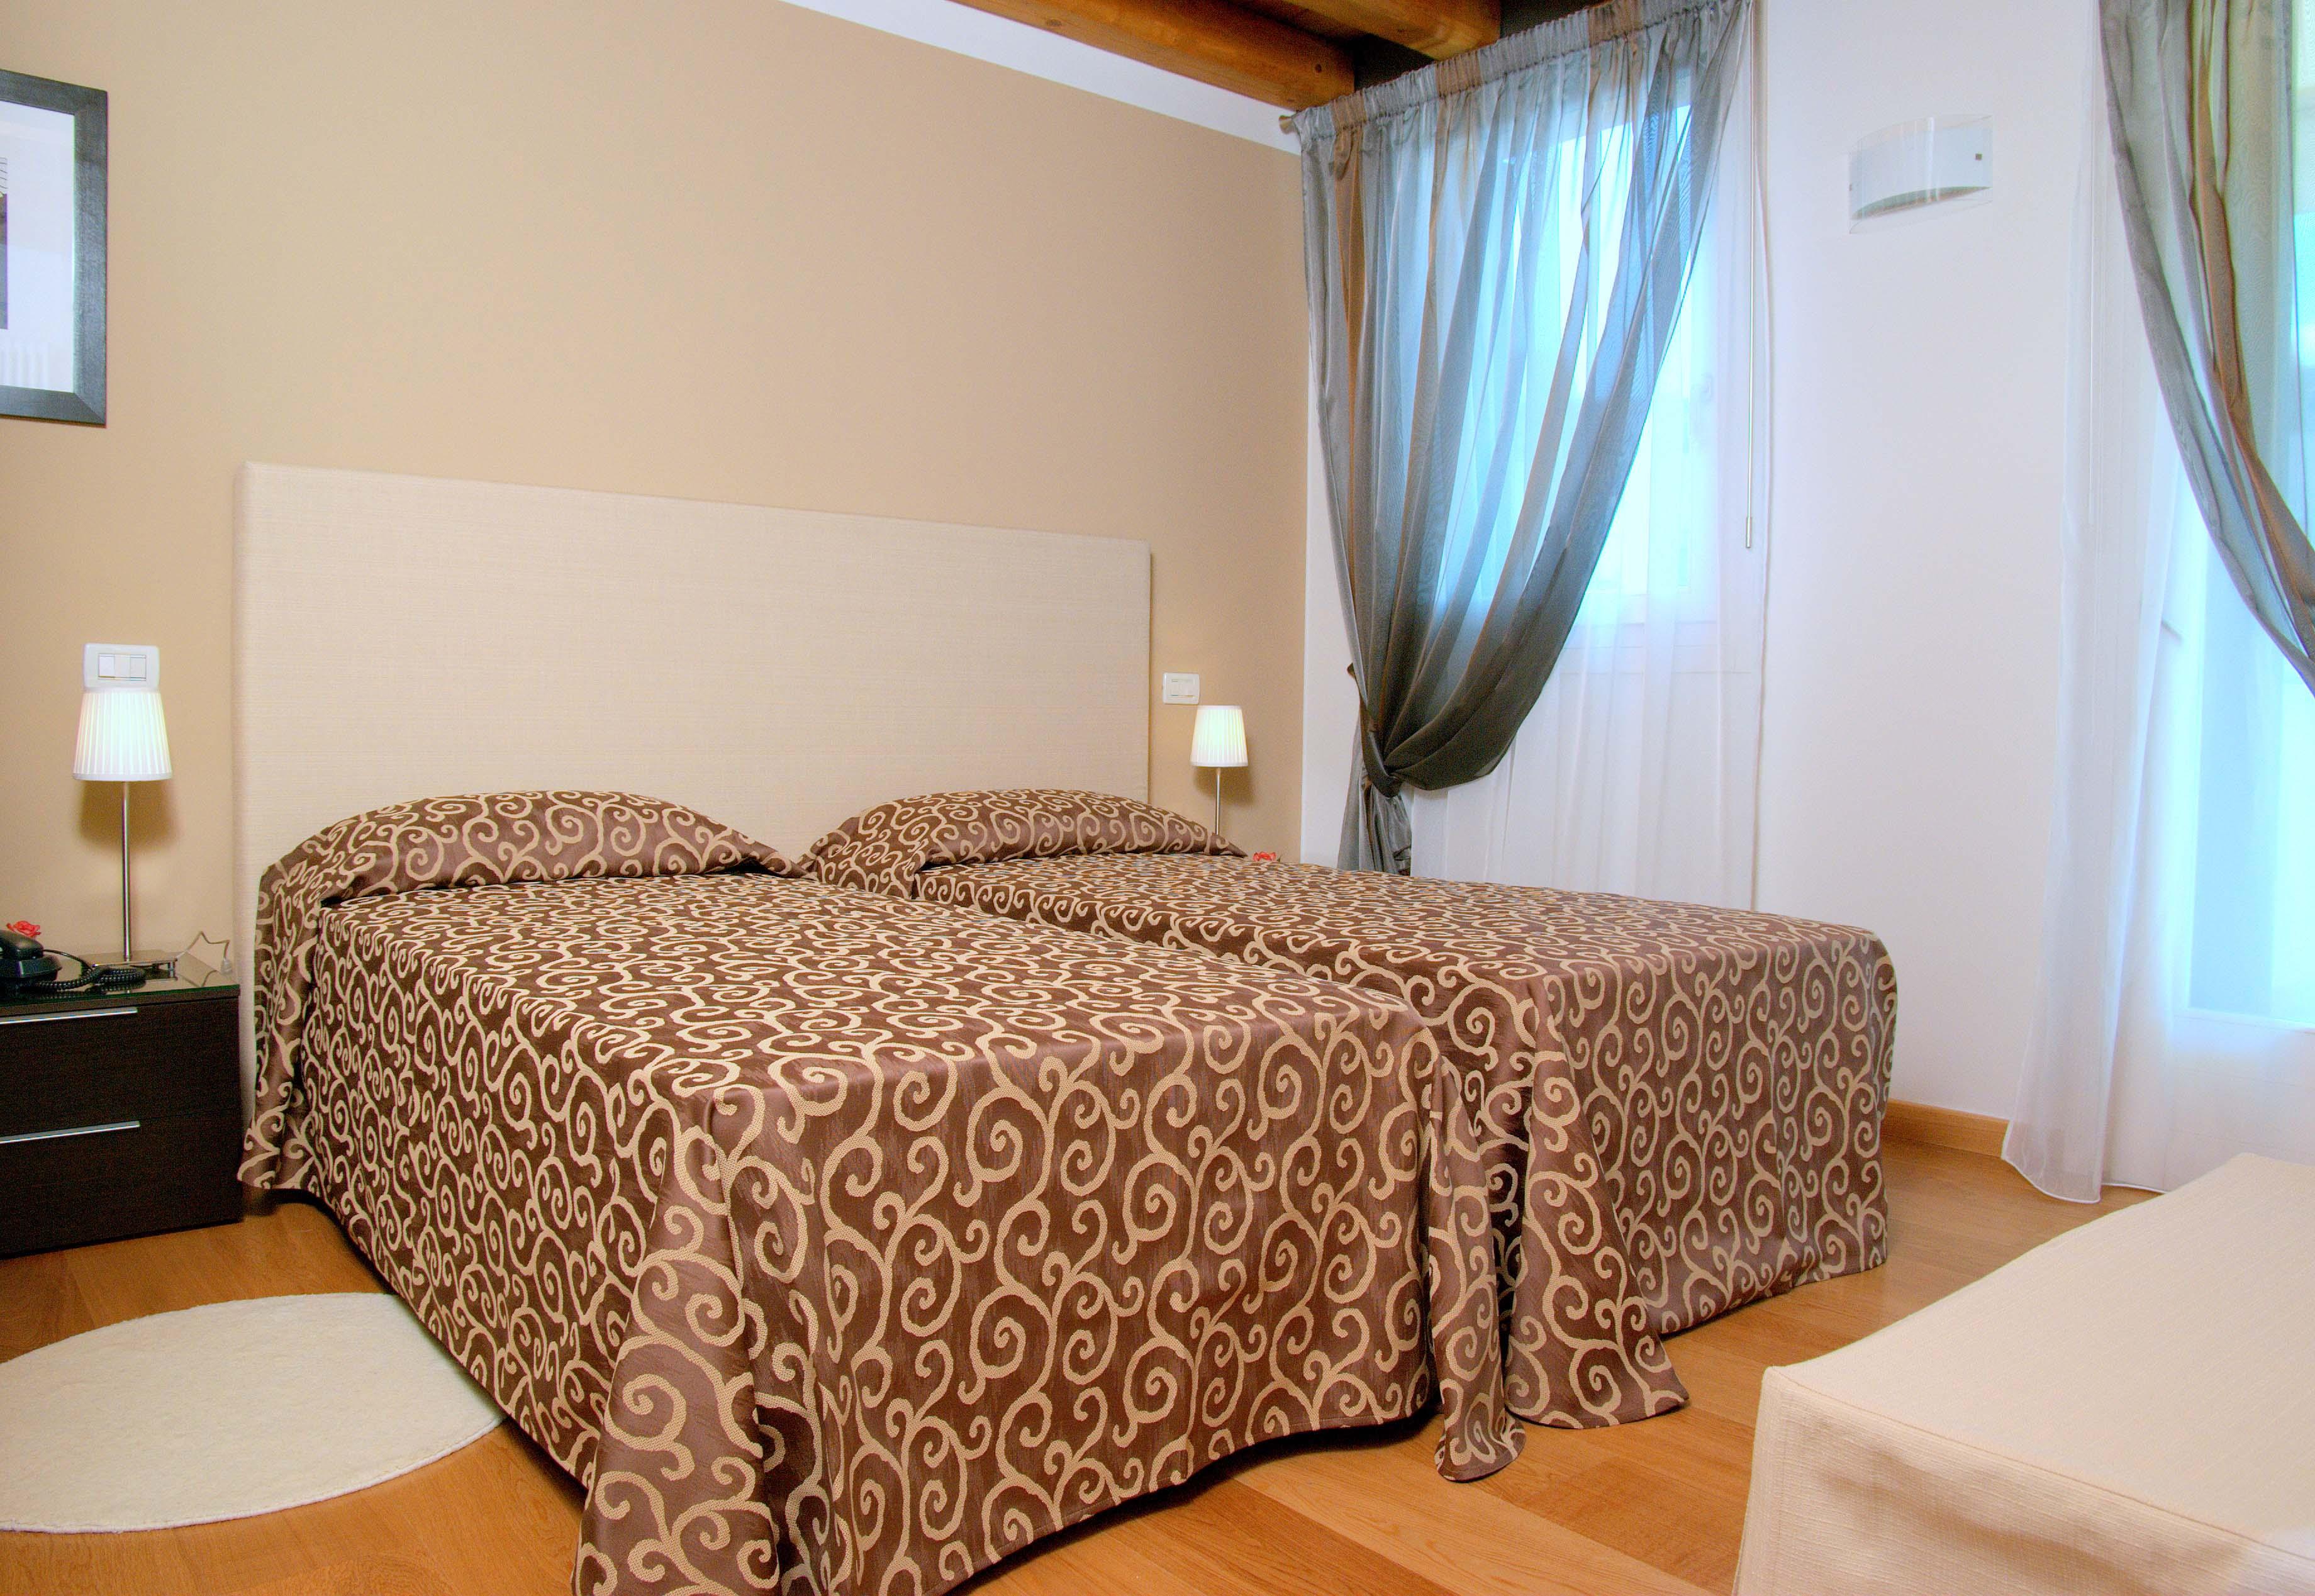 Hotel Rovere Viale G. G. Felissent, 13 Treviso